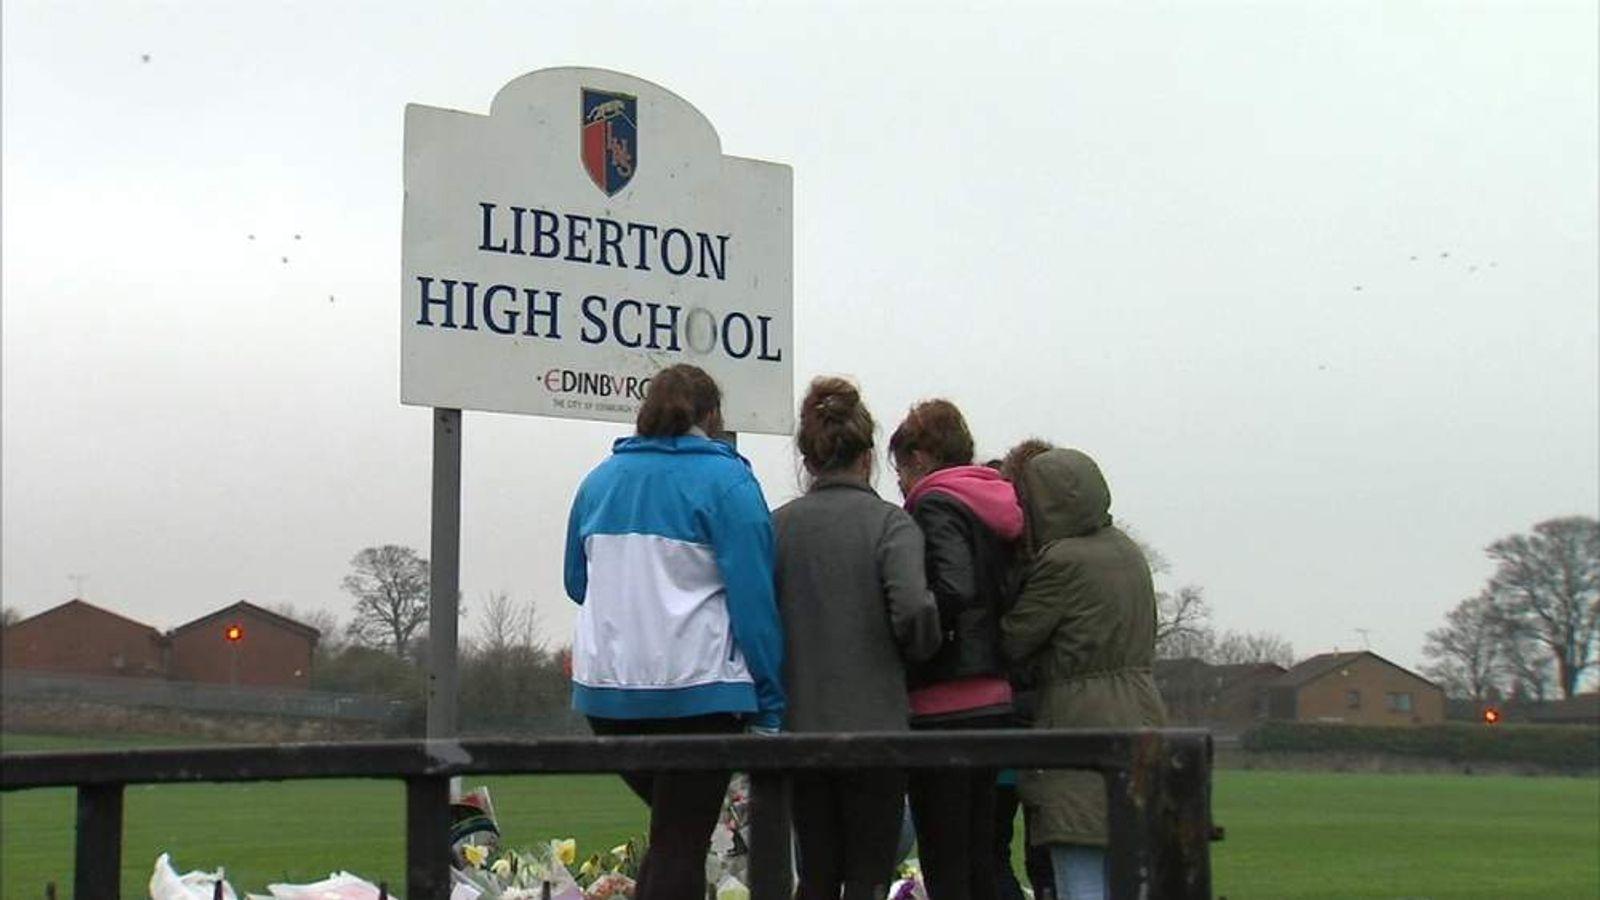 Liberton High School